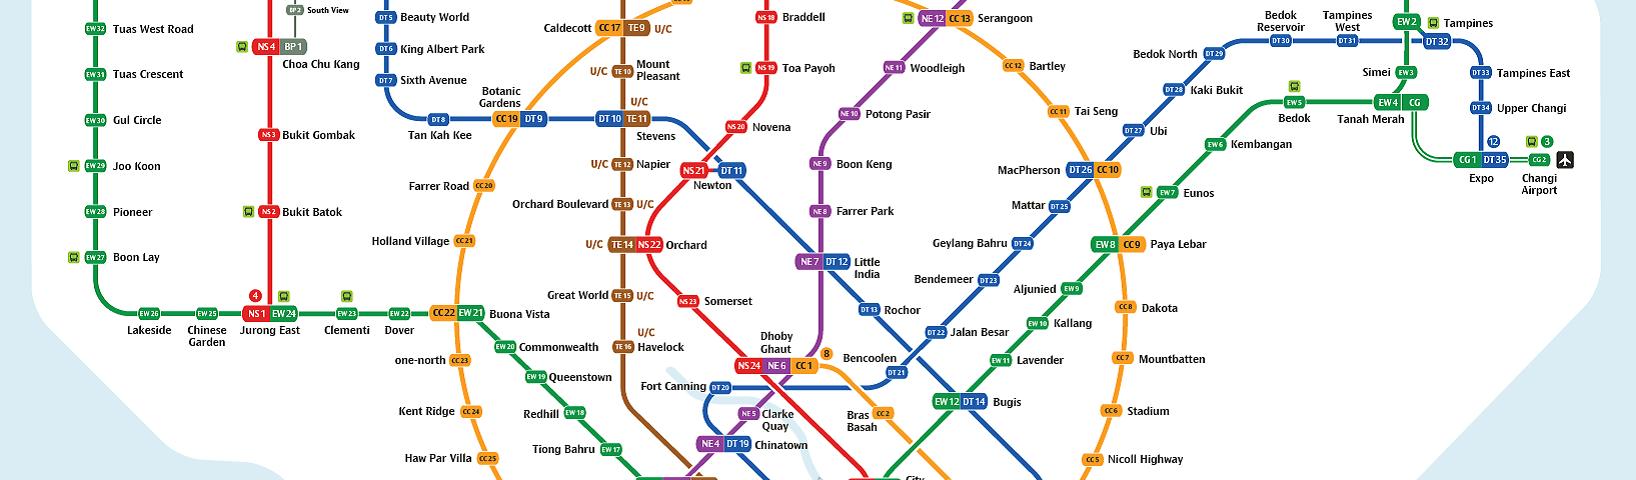 2019 singapore mrt map